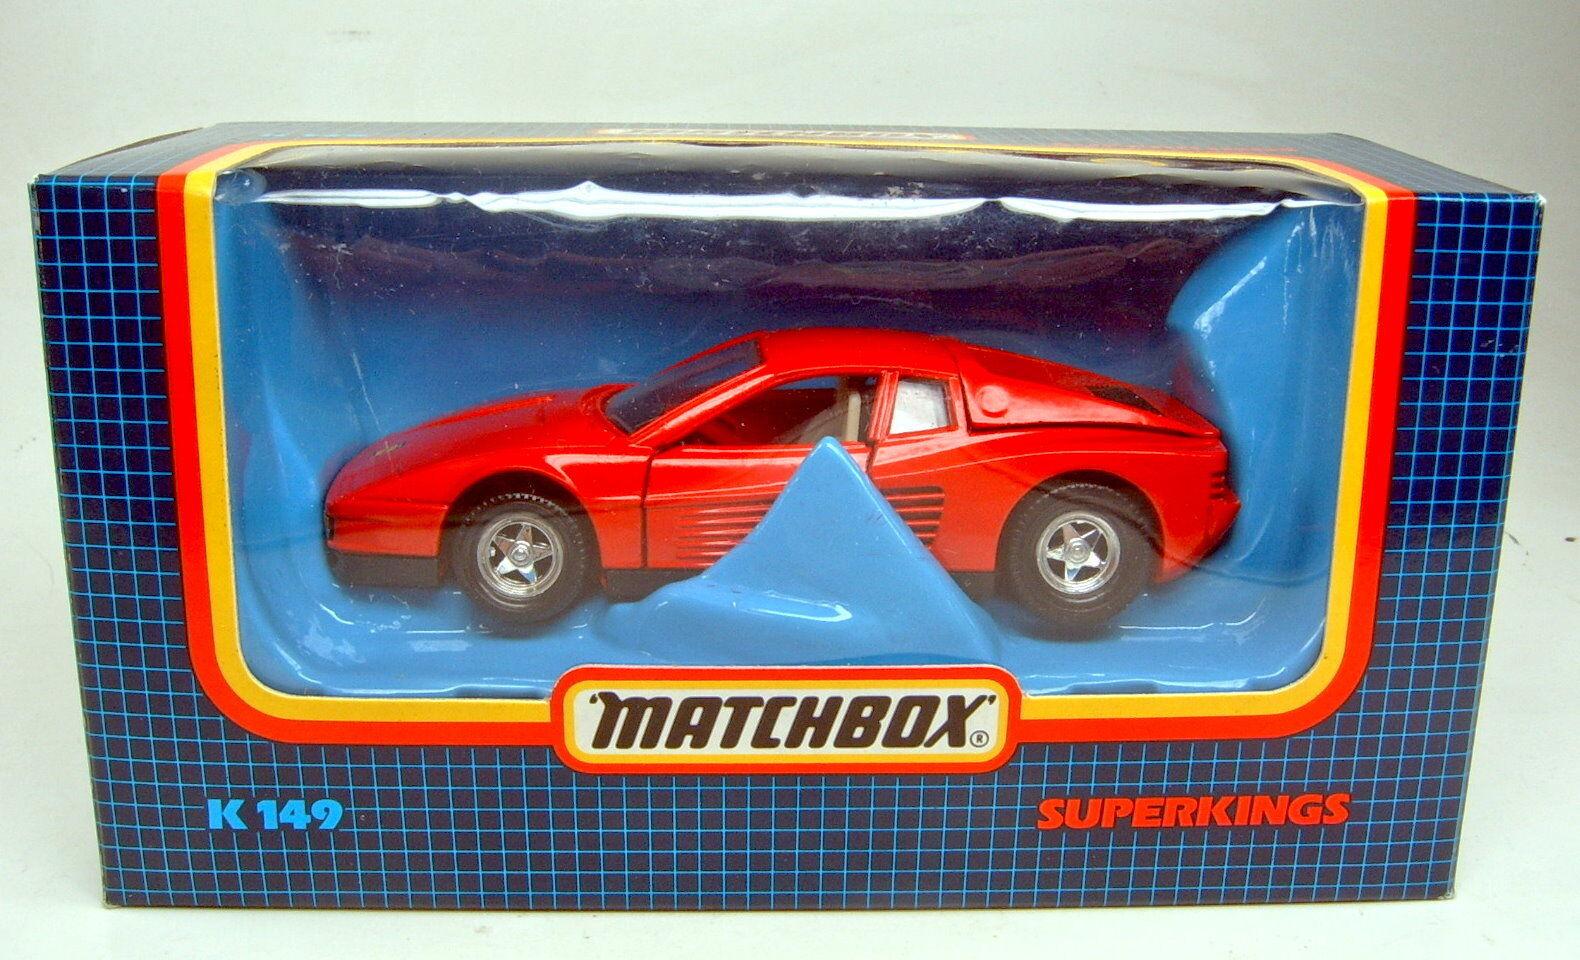 Matchbox Superking Superking Superking K-149 Ferrari Testarossa red top in Box 72f3f4